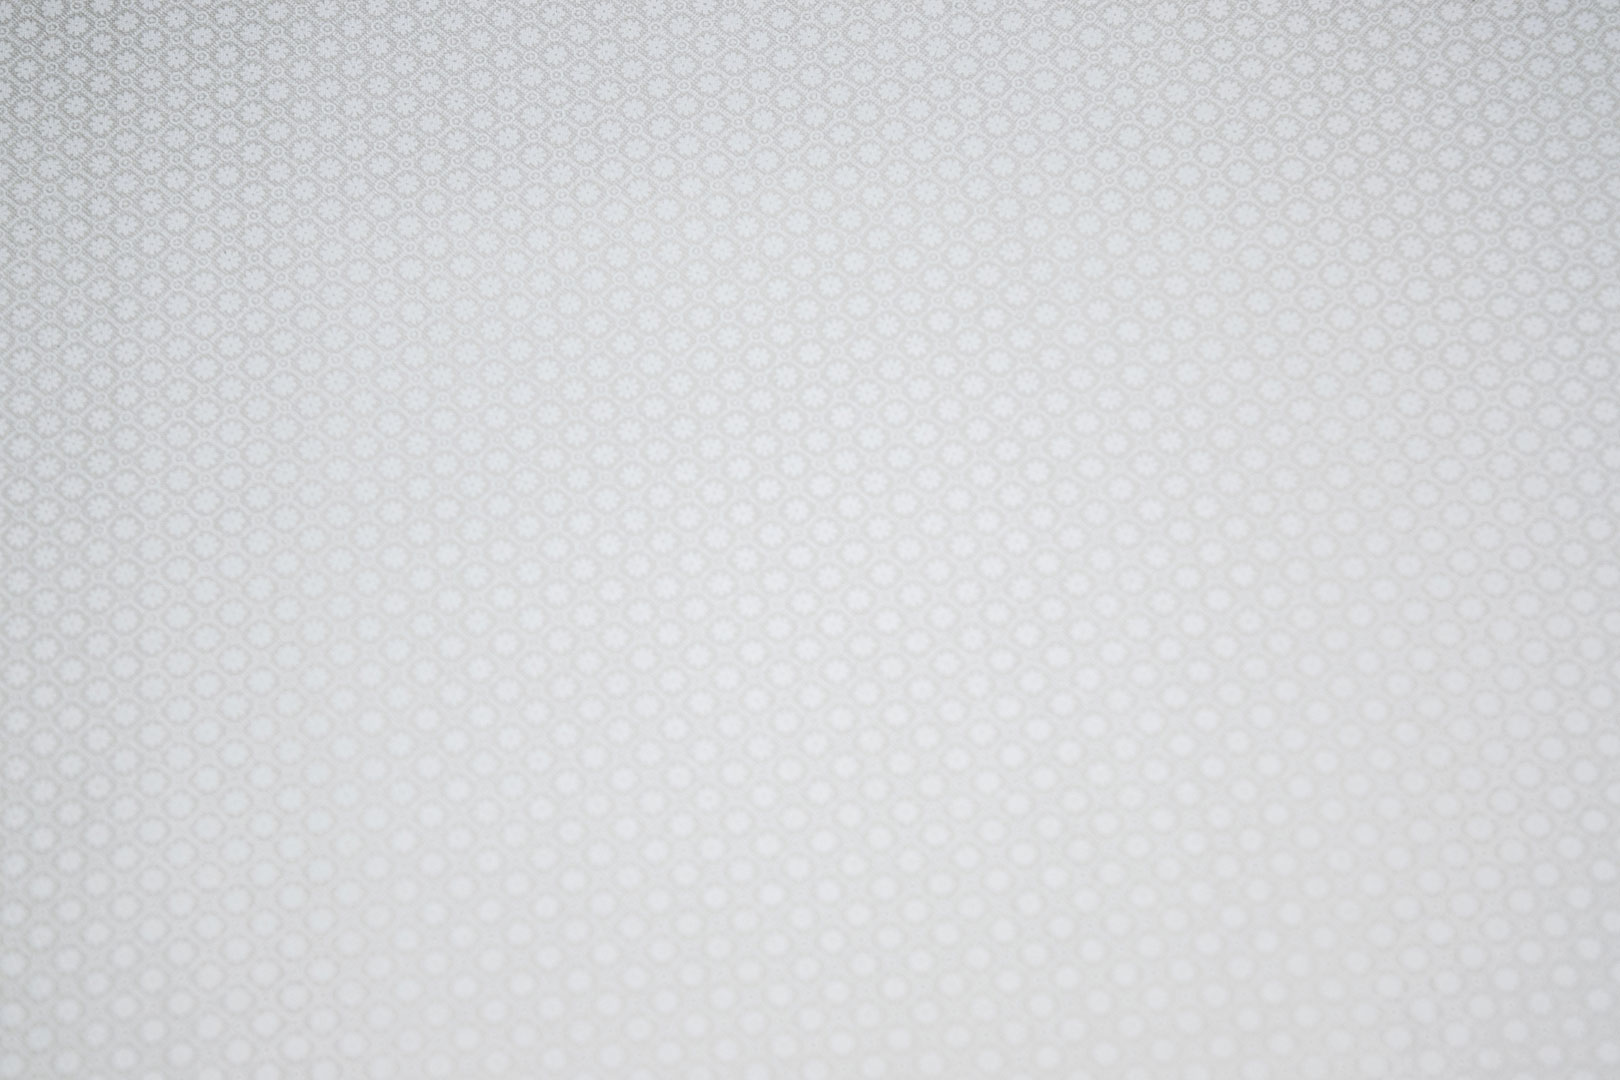 "8_21111_ww   44/45"" 68/68, 100% Carded Cotton"